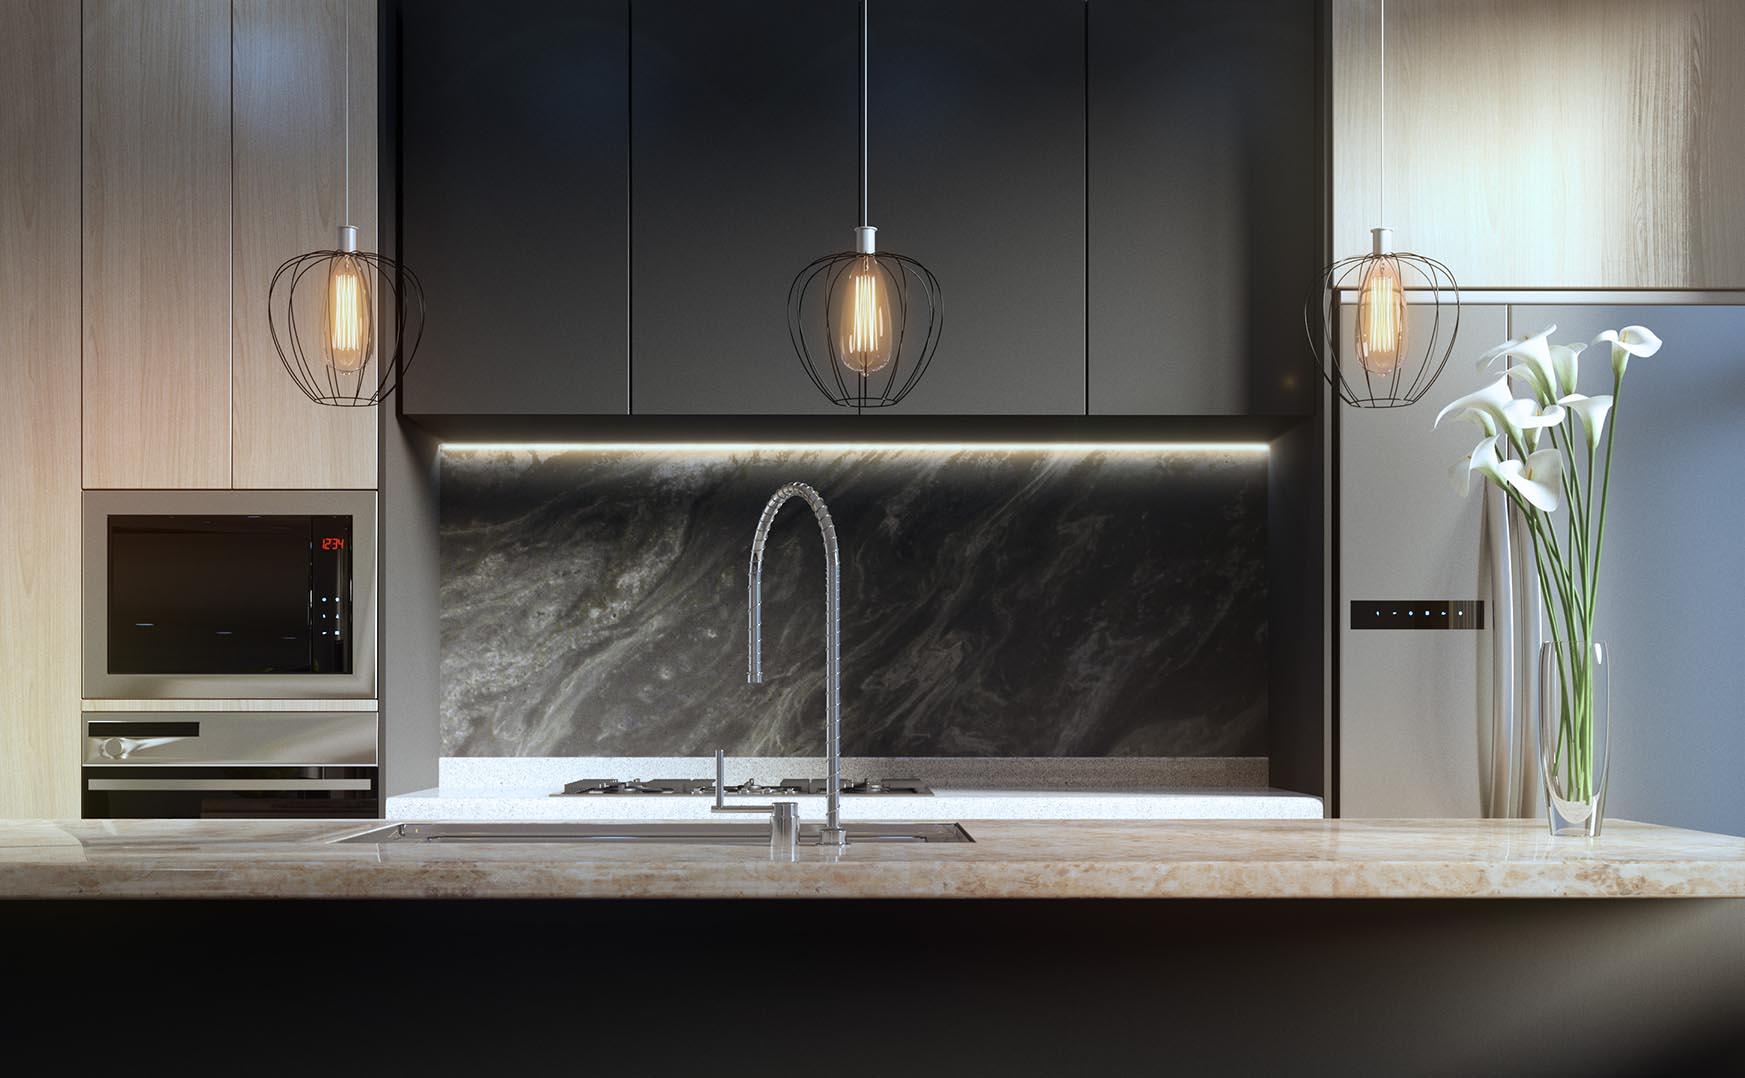 Kitchen photo realistic render